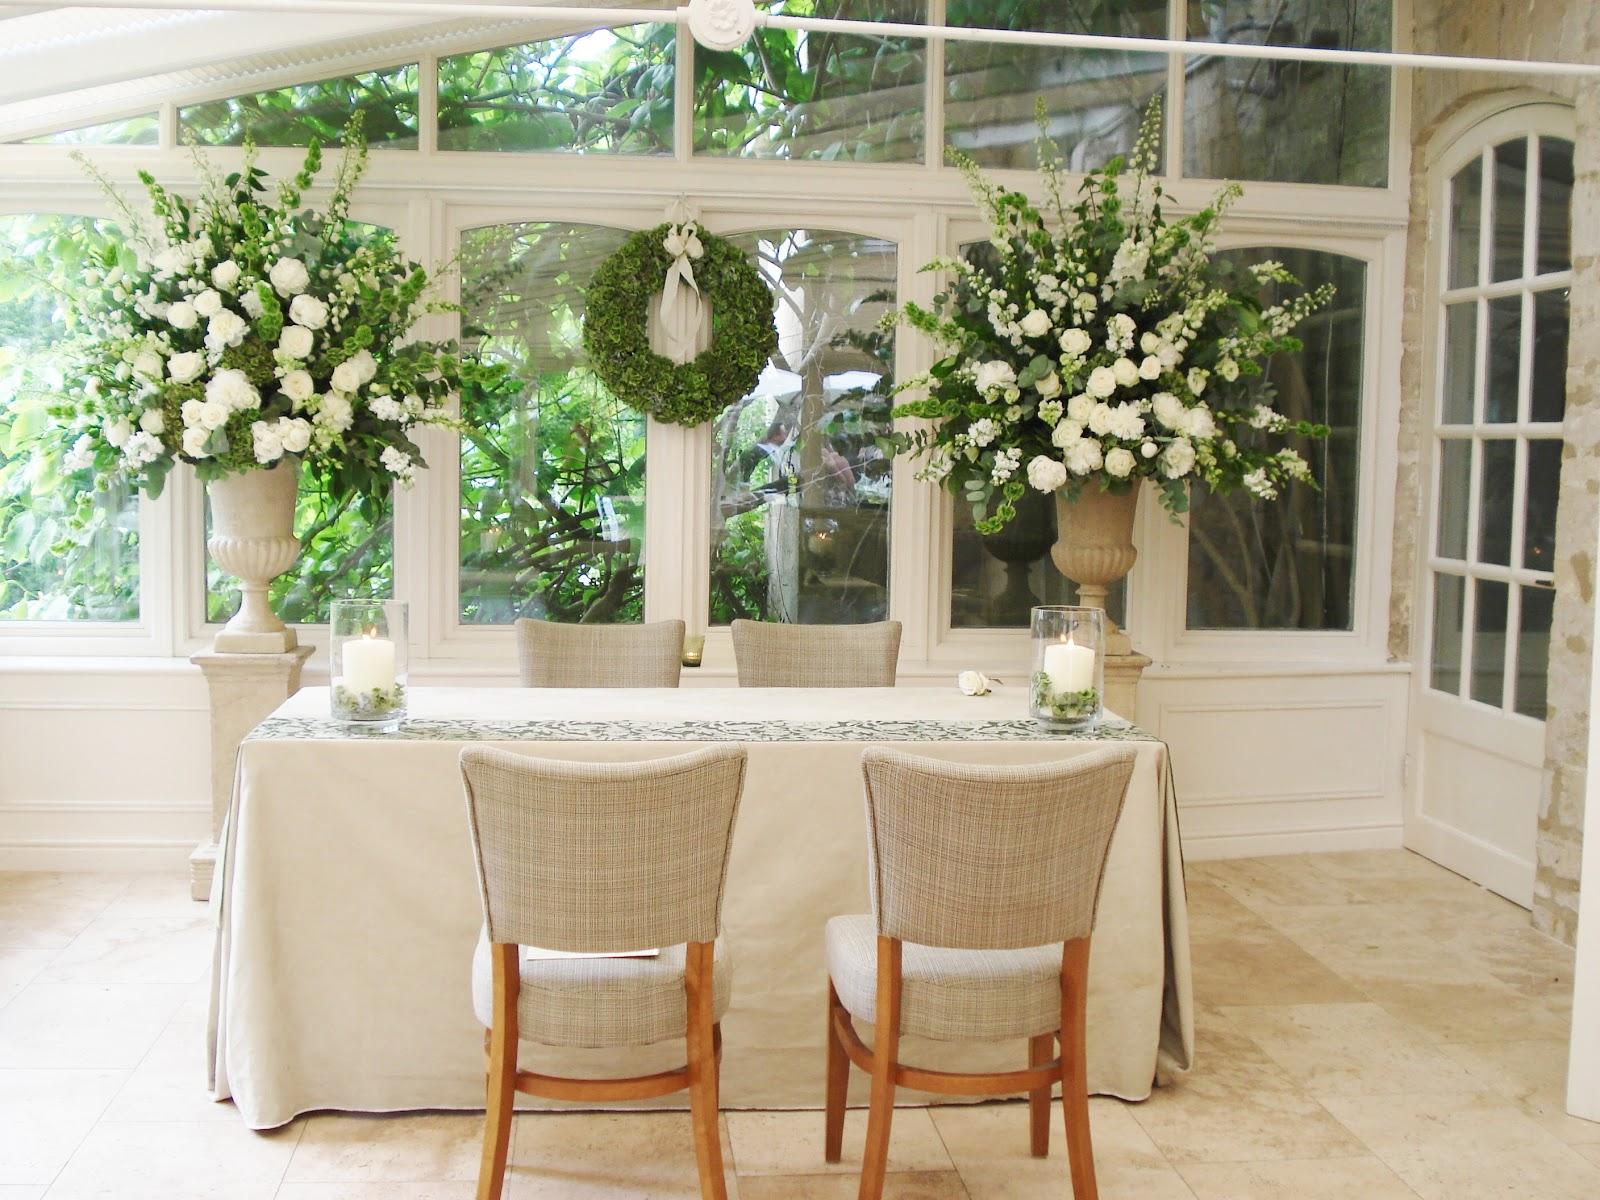 Wedding ceremony flower ideas wedding ceremony for Wedding ceremony table decorations